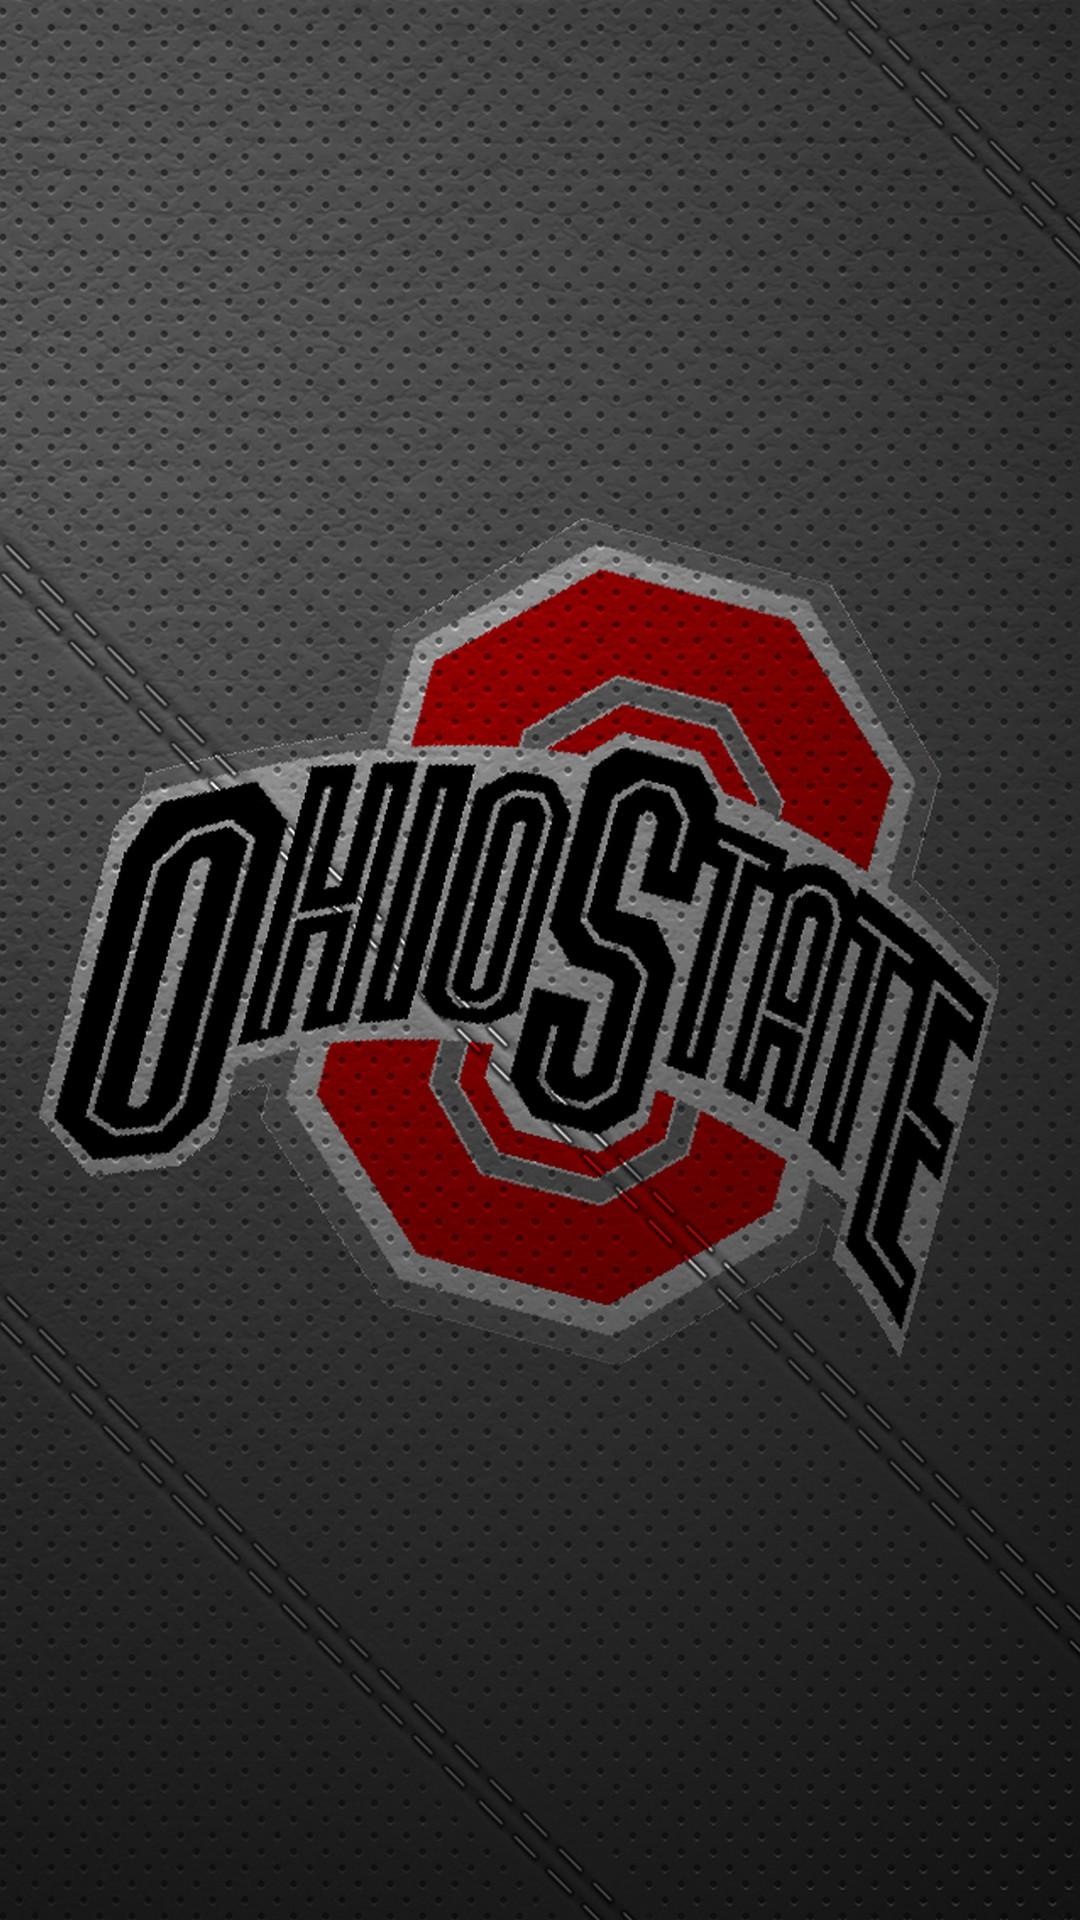 Iphone X Ohio State Buckeyes Football Resolution - Ohio State Buckeyes Iphone X - HD Wallpaper